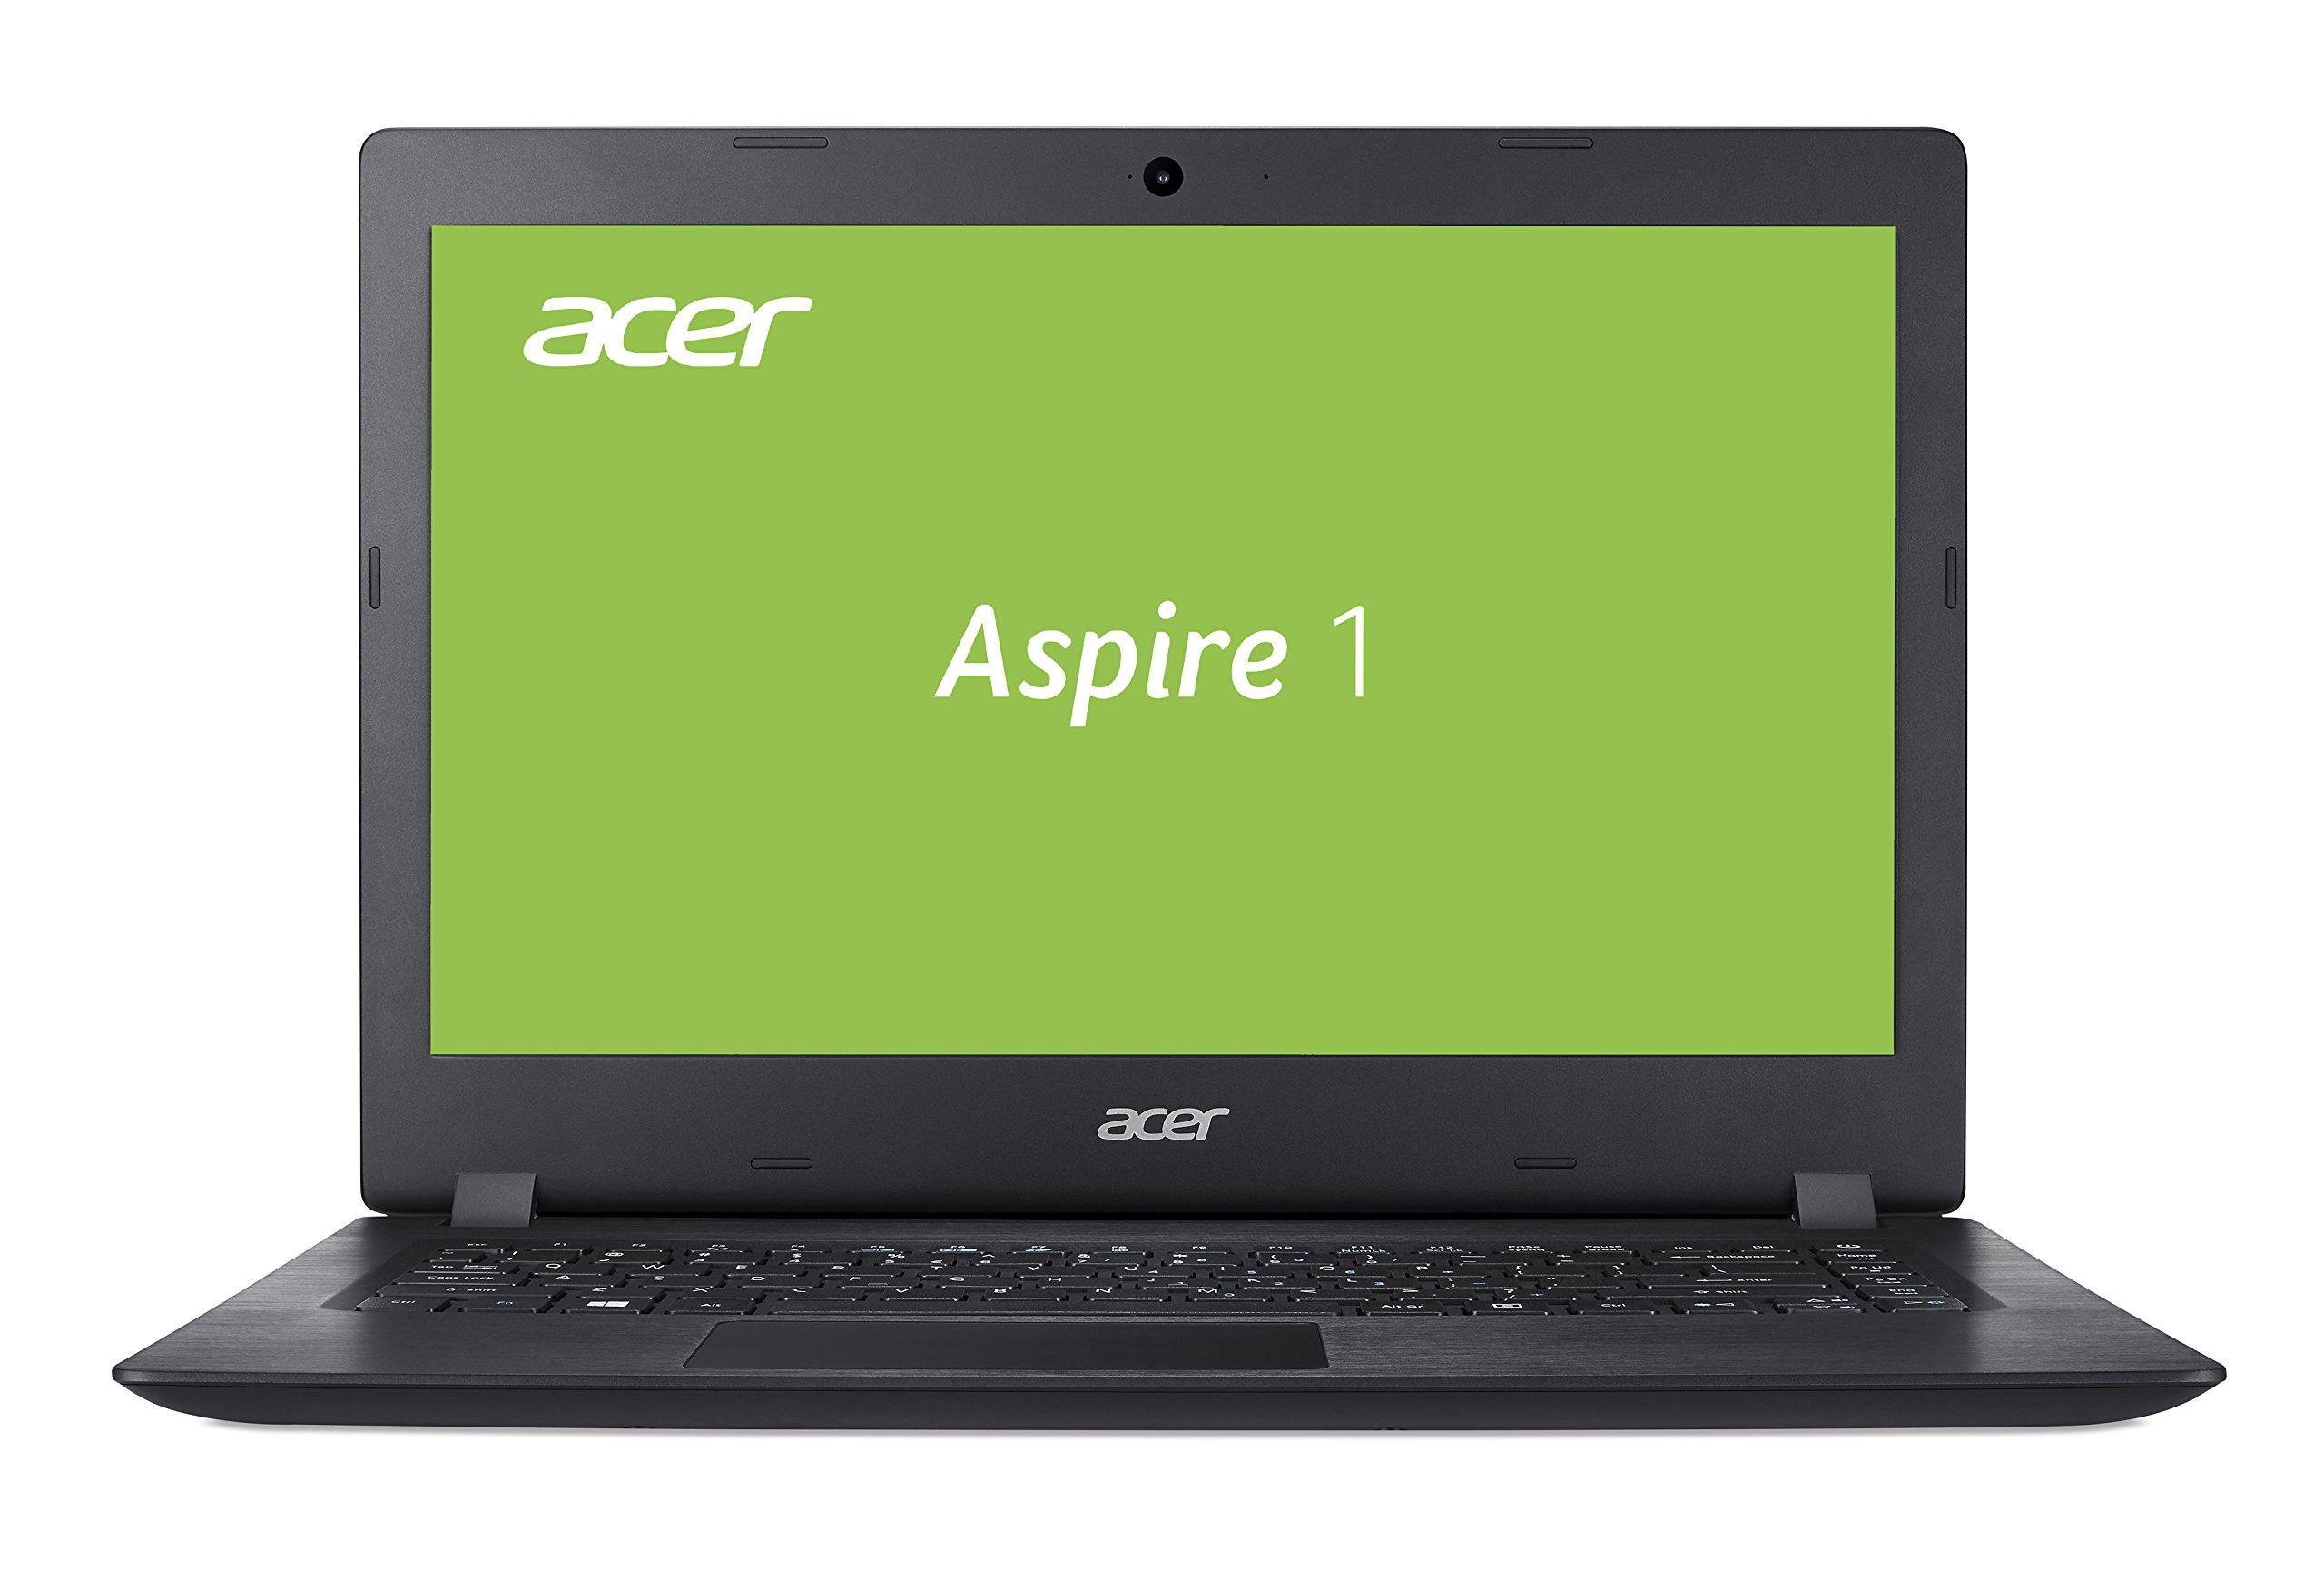 Acer Acer Aspire 1 35.6 cmマルチメディアノートブック(4 GB RAM)黒黒曜石Schwarz 64 GB eMMC